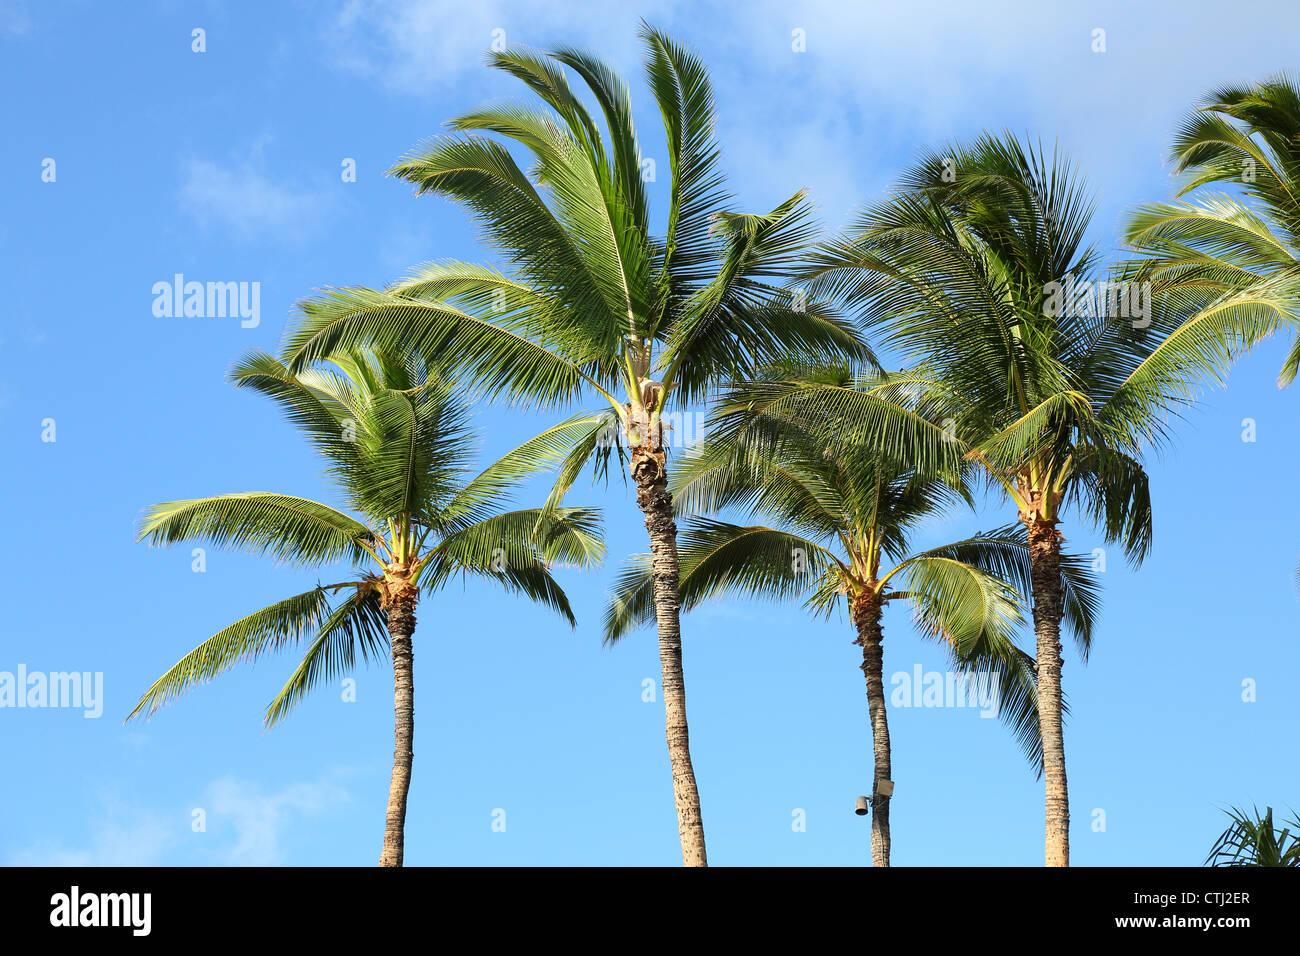 Tropical Palm Trees, Hawaii - Stock Image